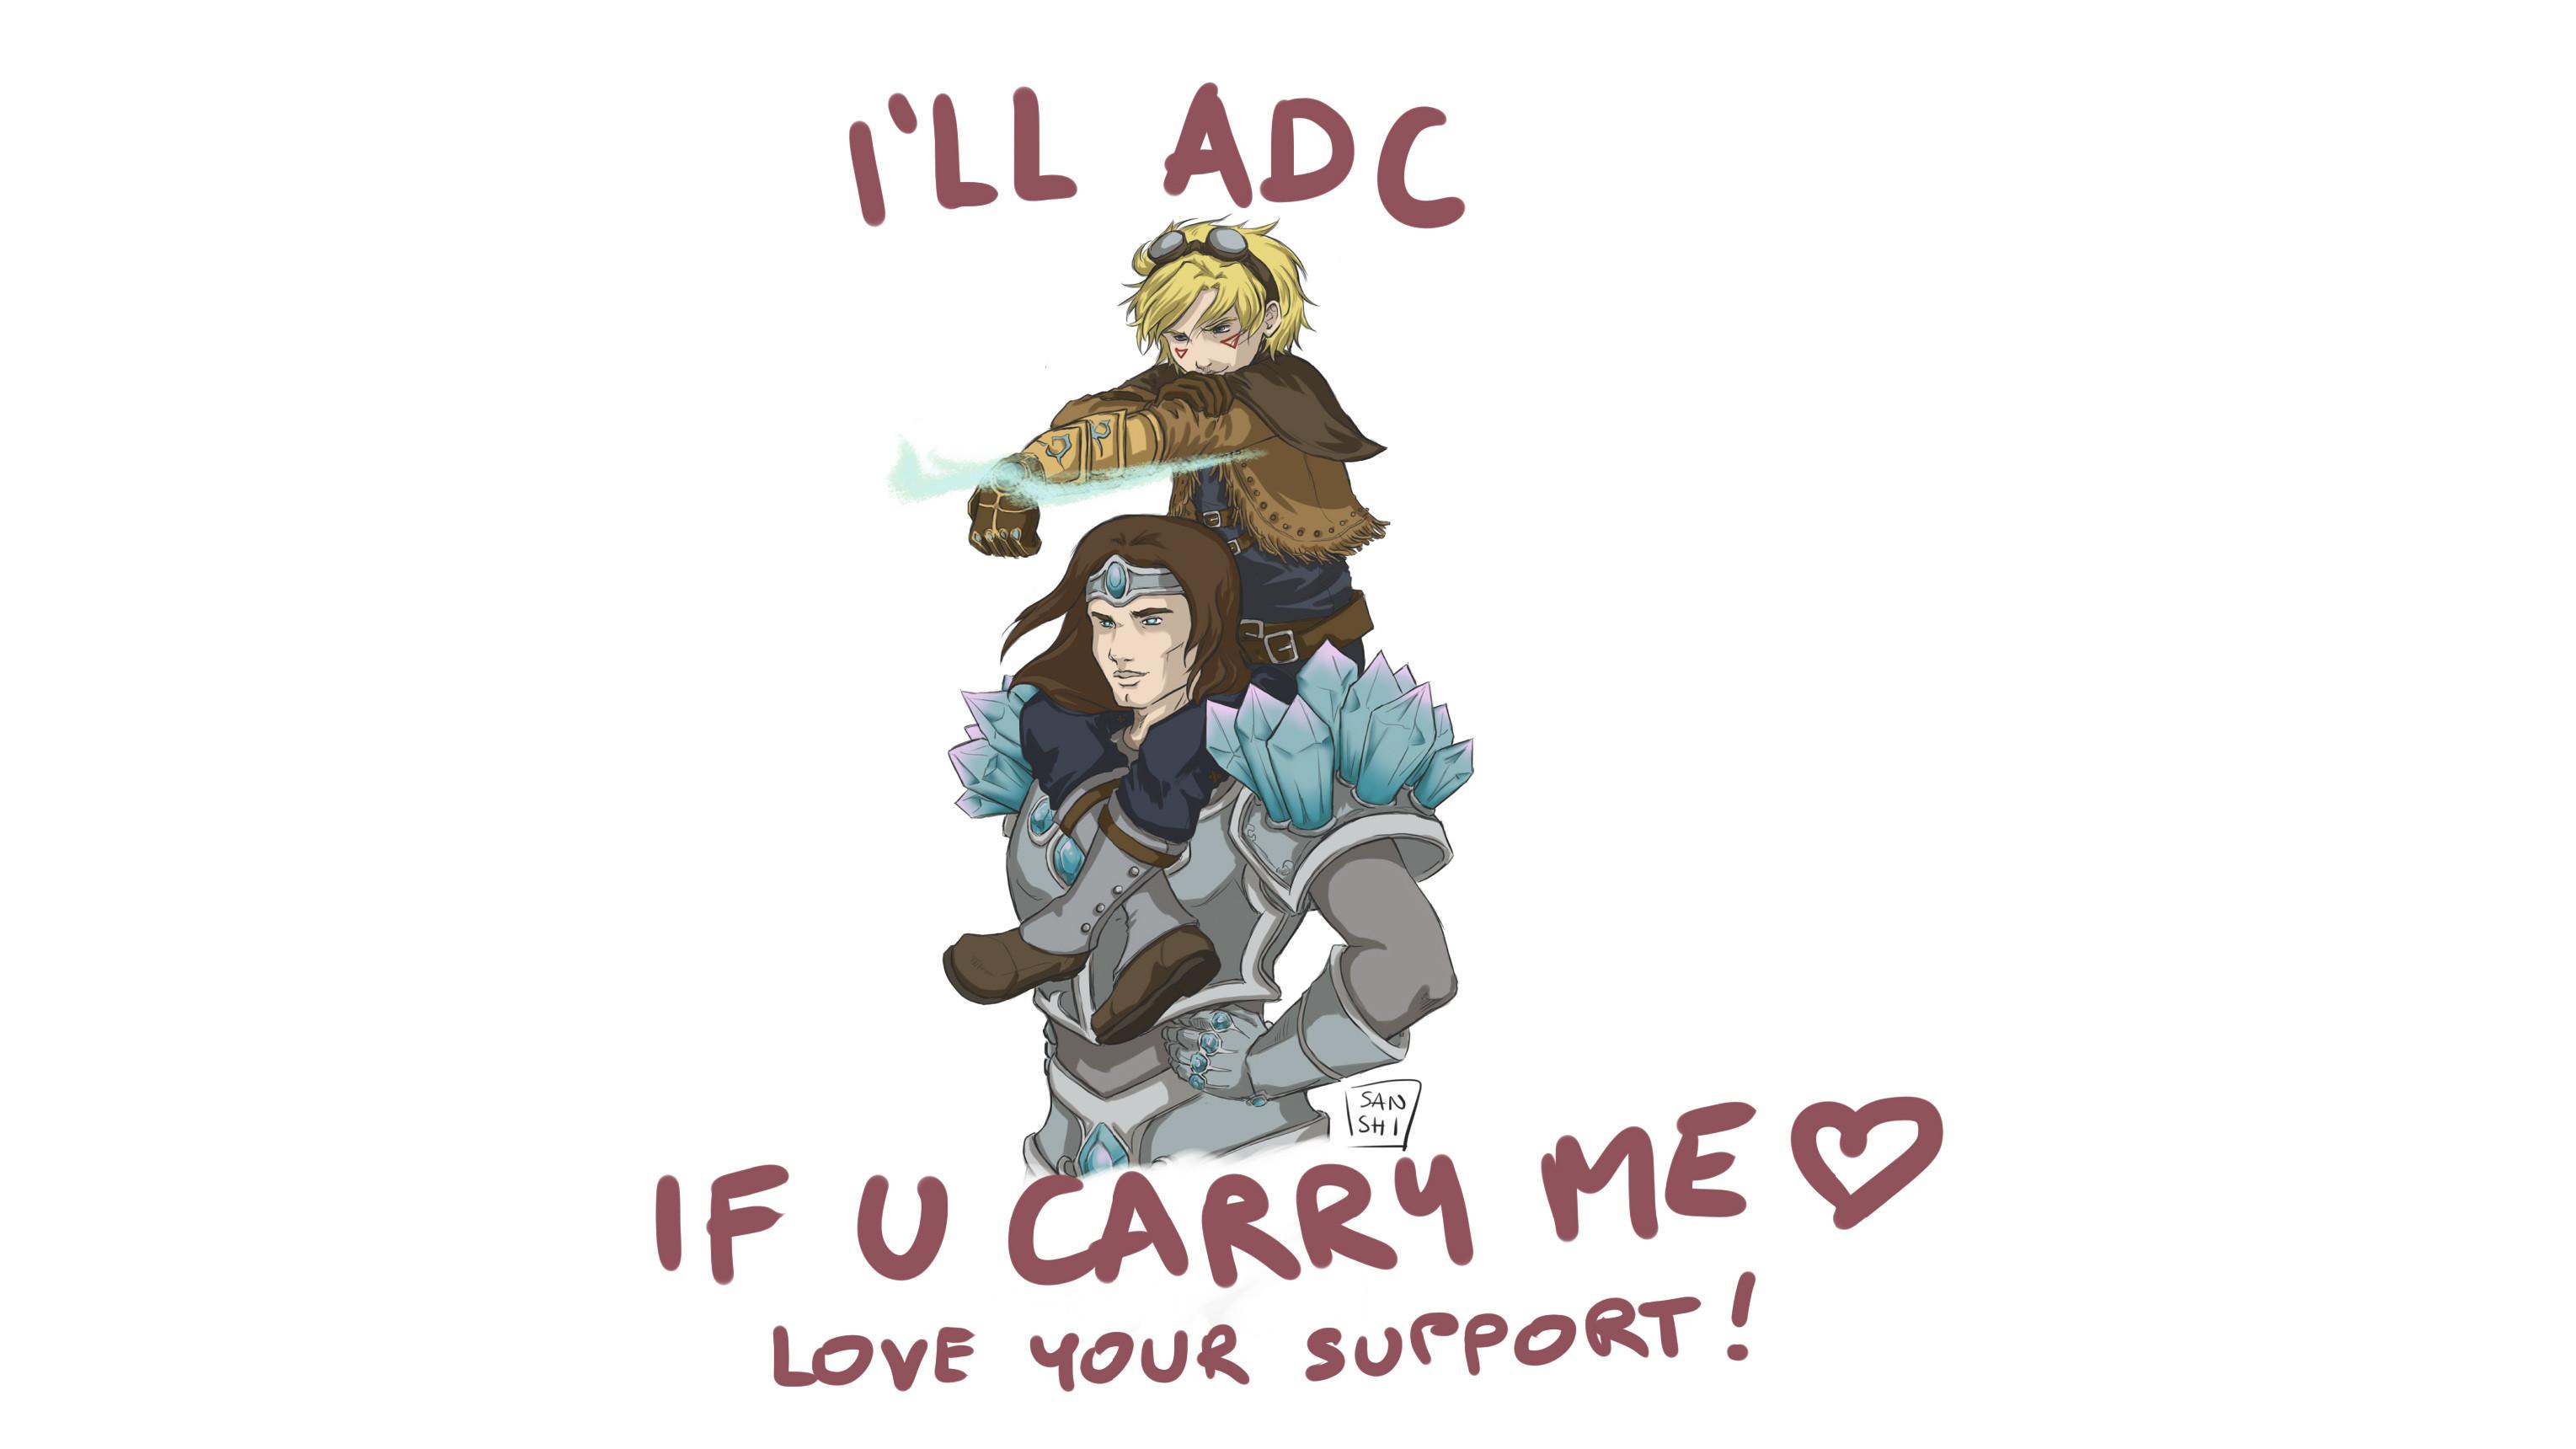 Ezreal & Taric (ADC & Support) by Sanshikisumire HD Wallpaper Fan Art  Artwork League